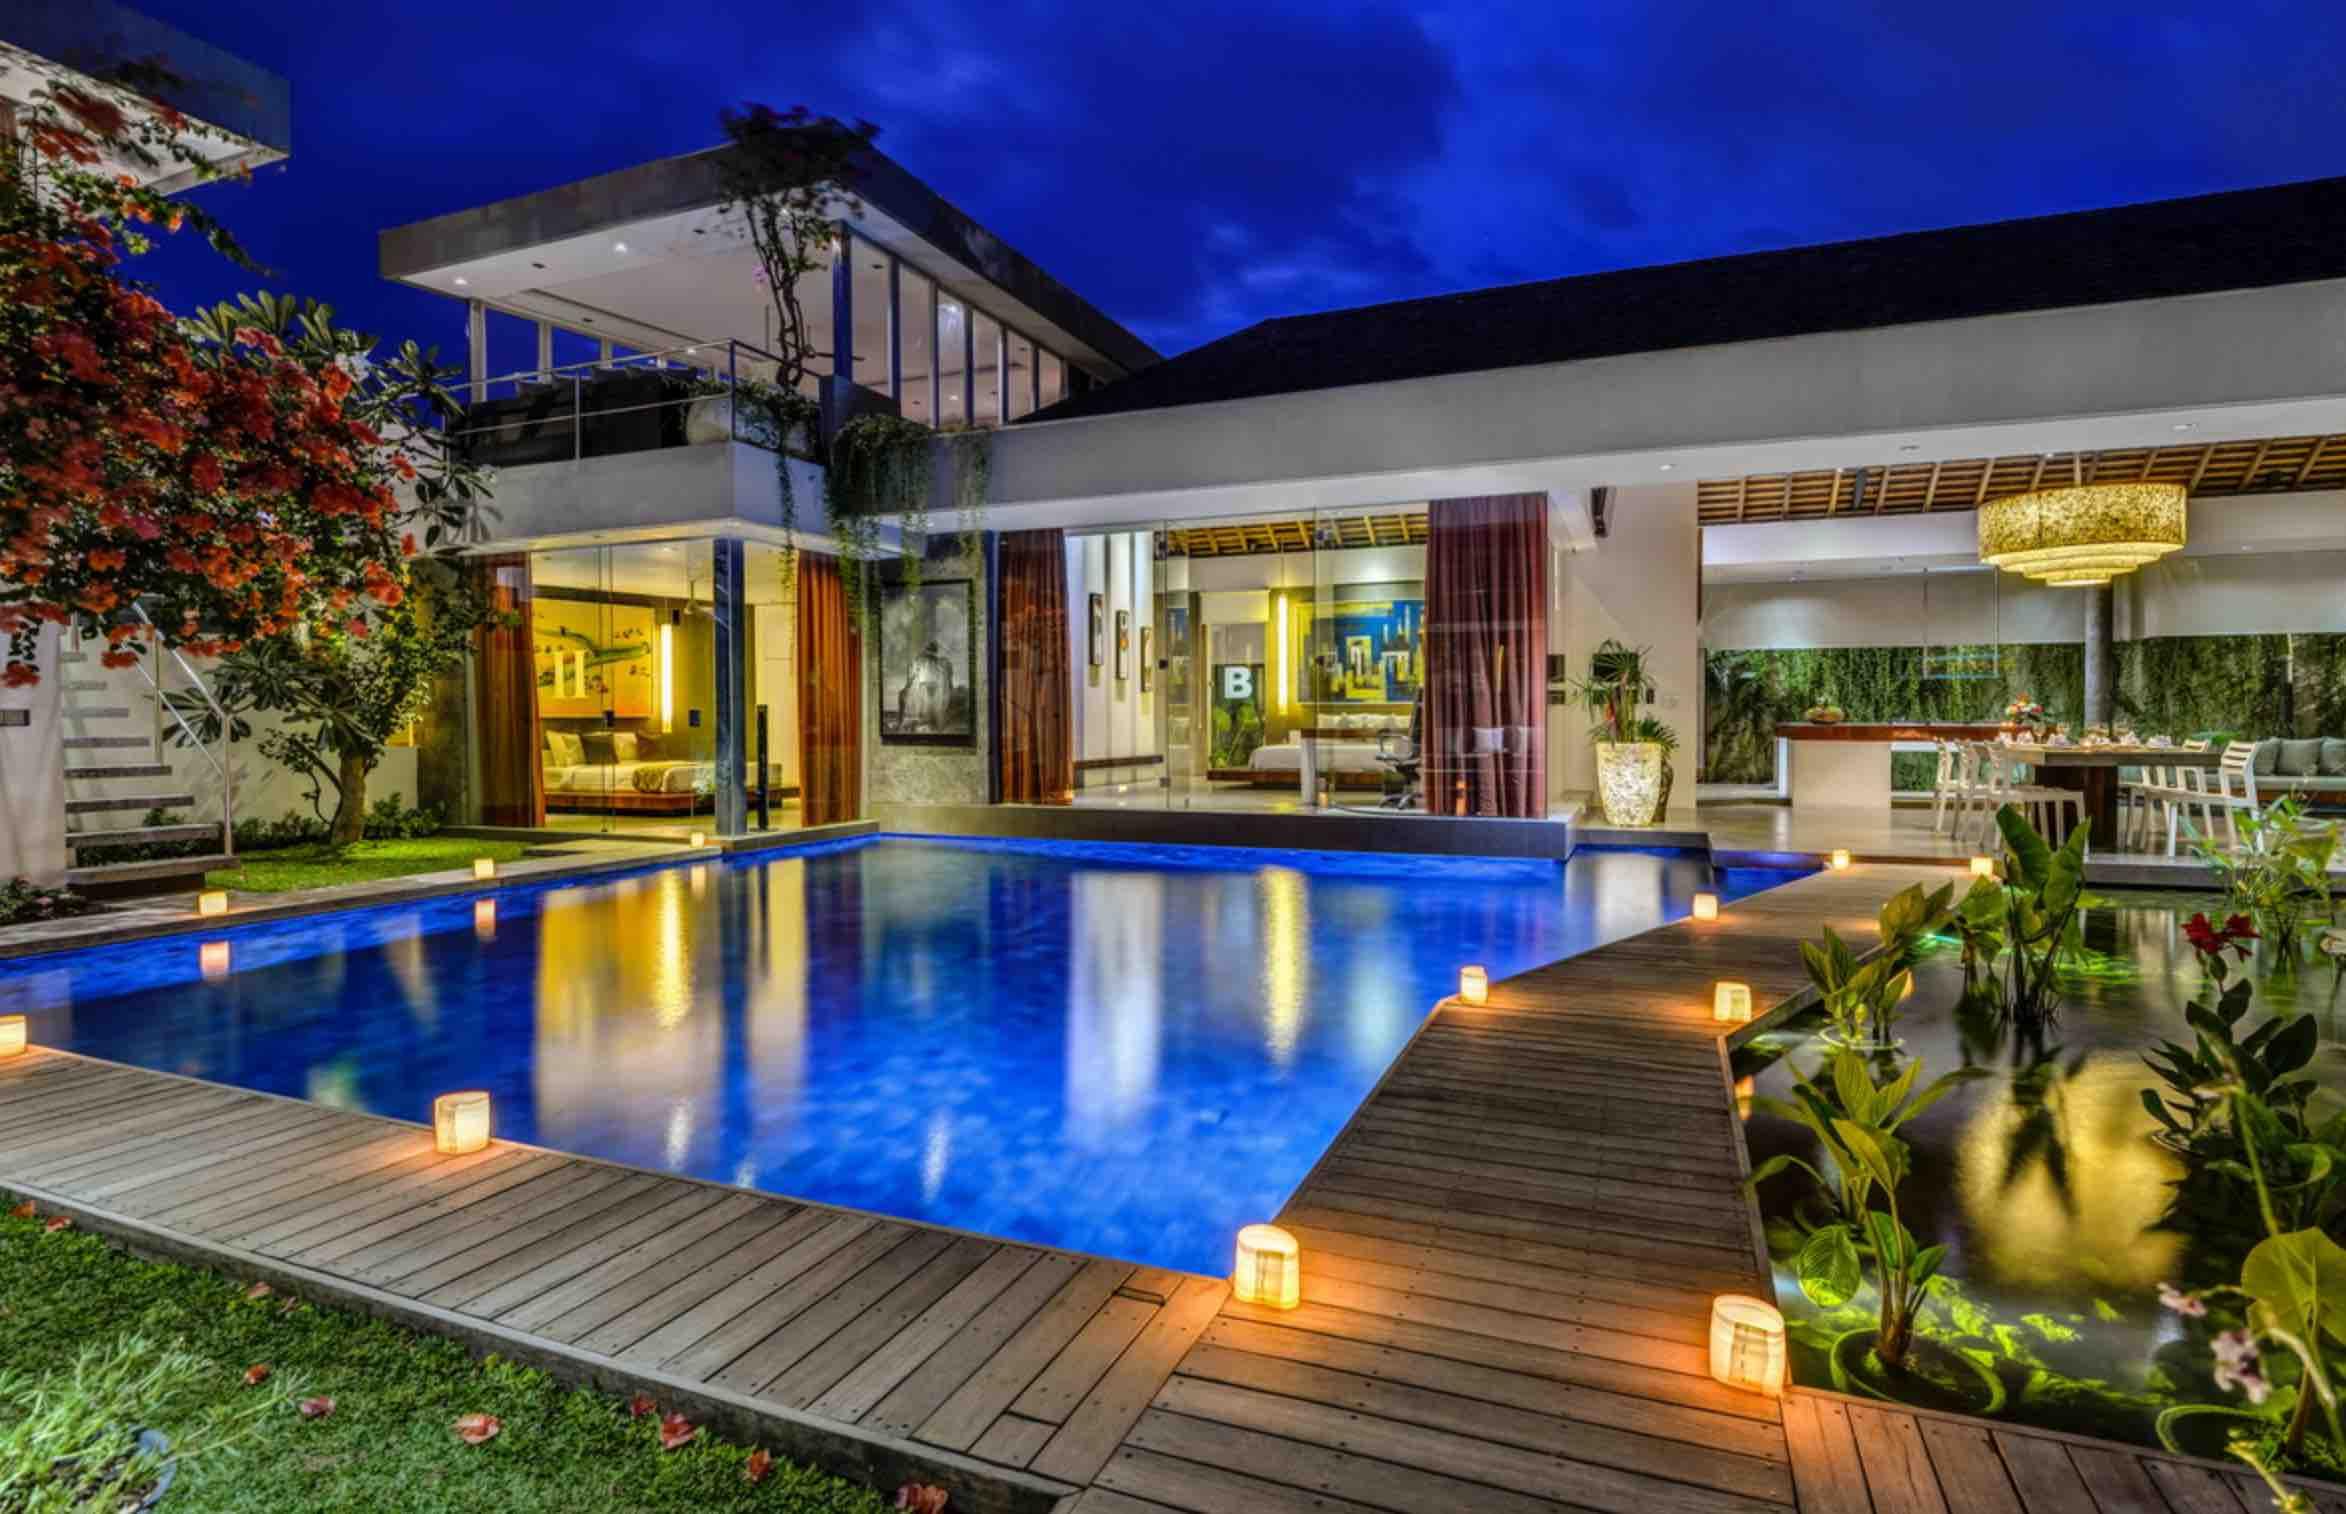 villa banyu - where to stay in Seminyak, bali